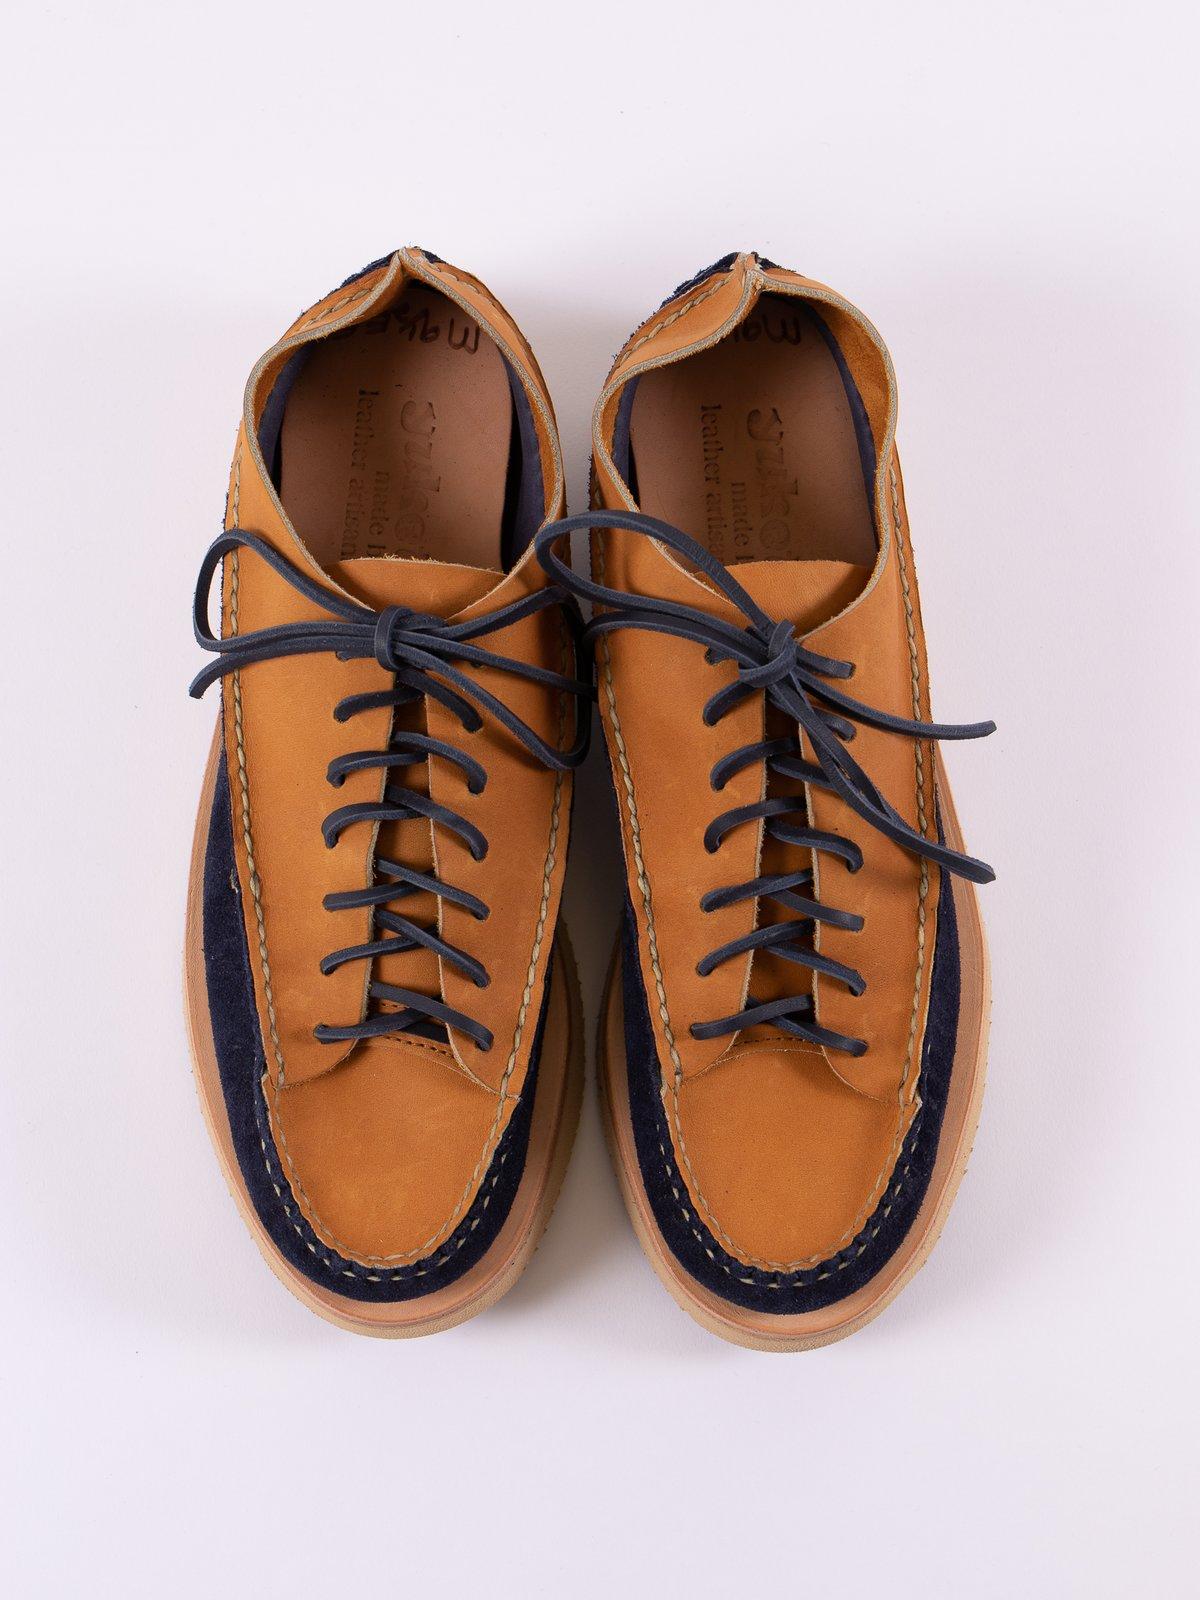 Indigo/Tan All Handsewn Sneaker Moc Ox Exclusive - Image 6